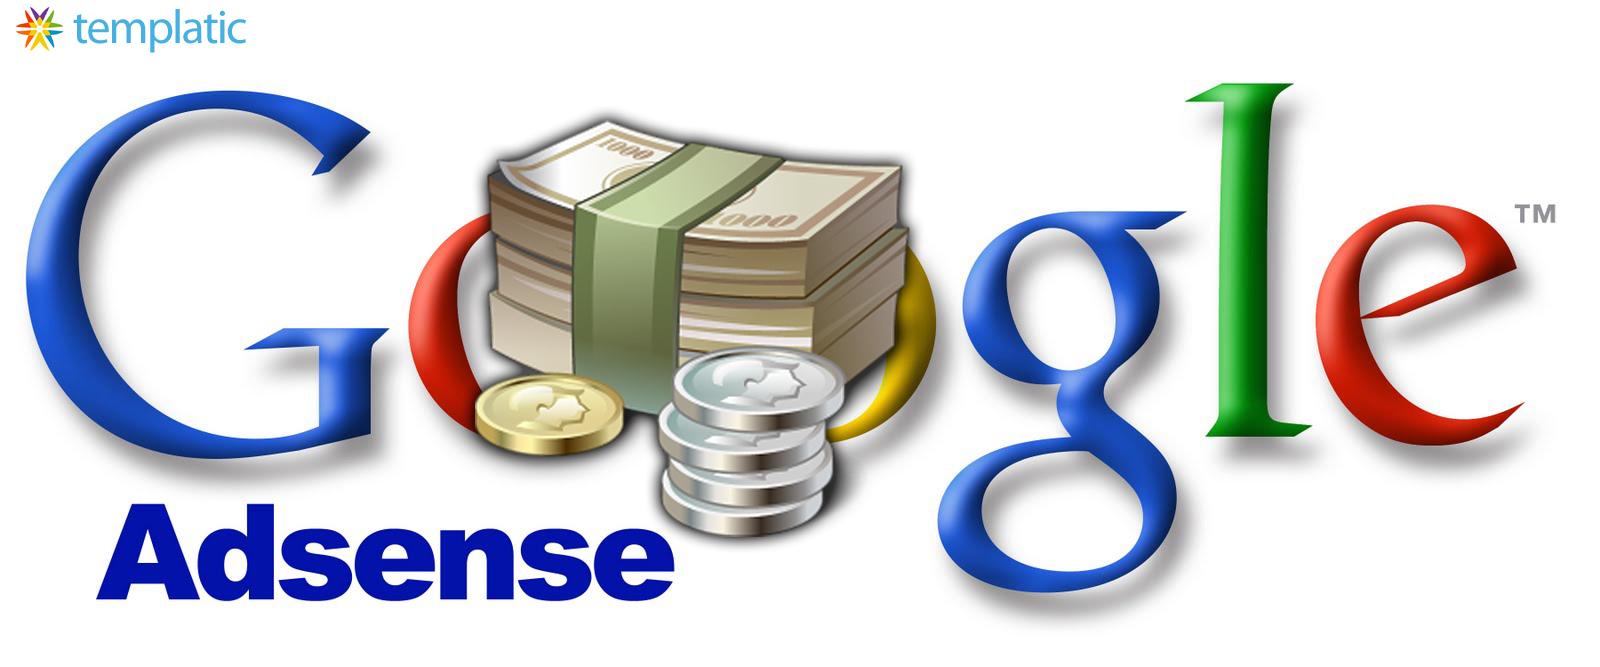 Templatic_Google_Adsens 02